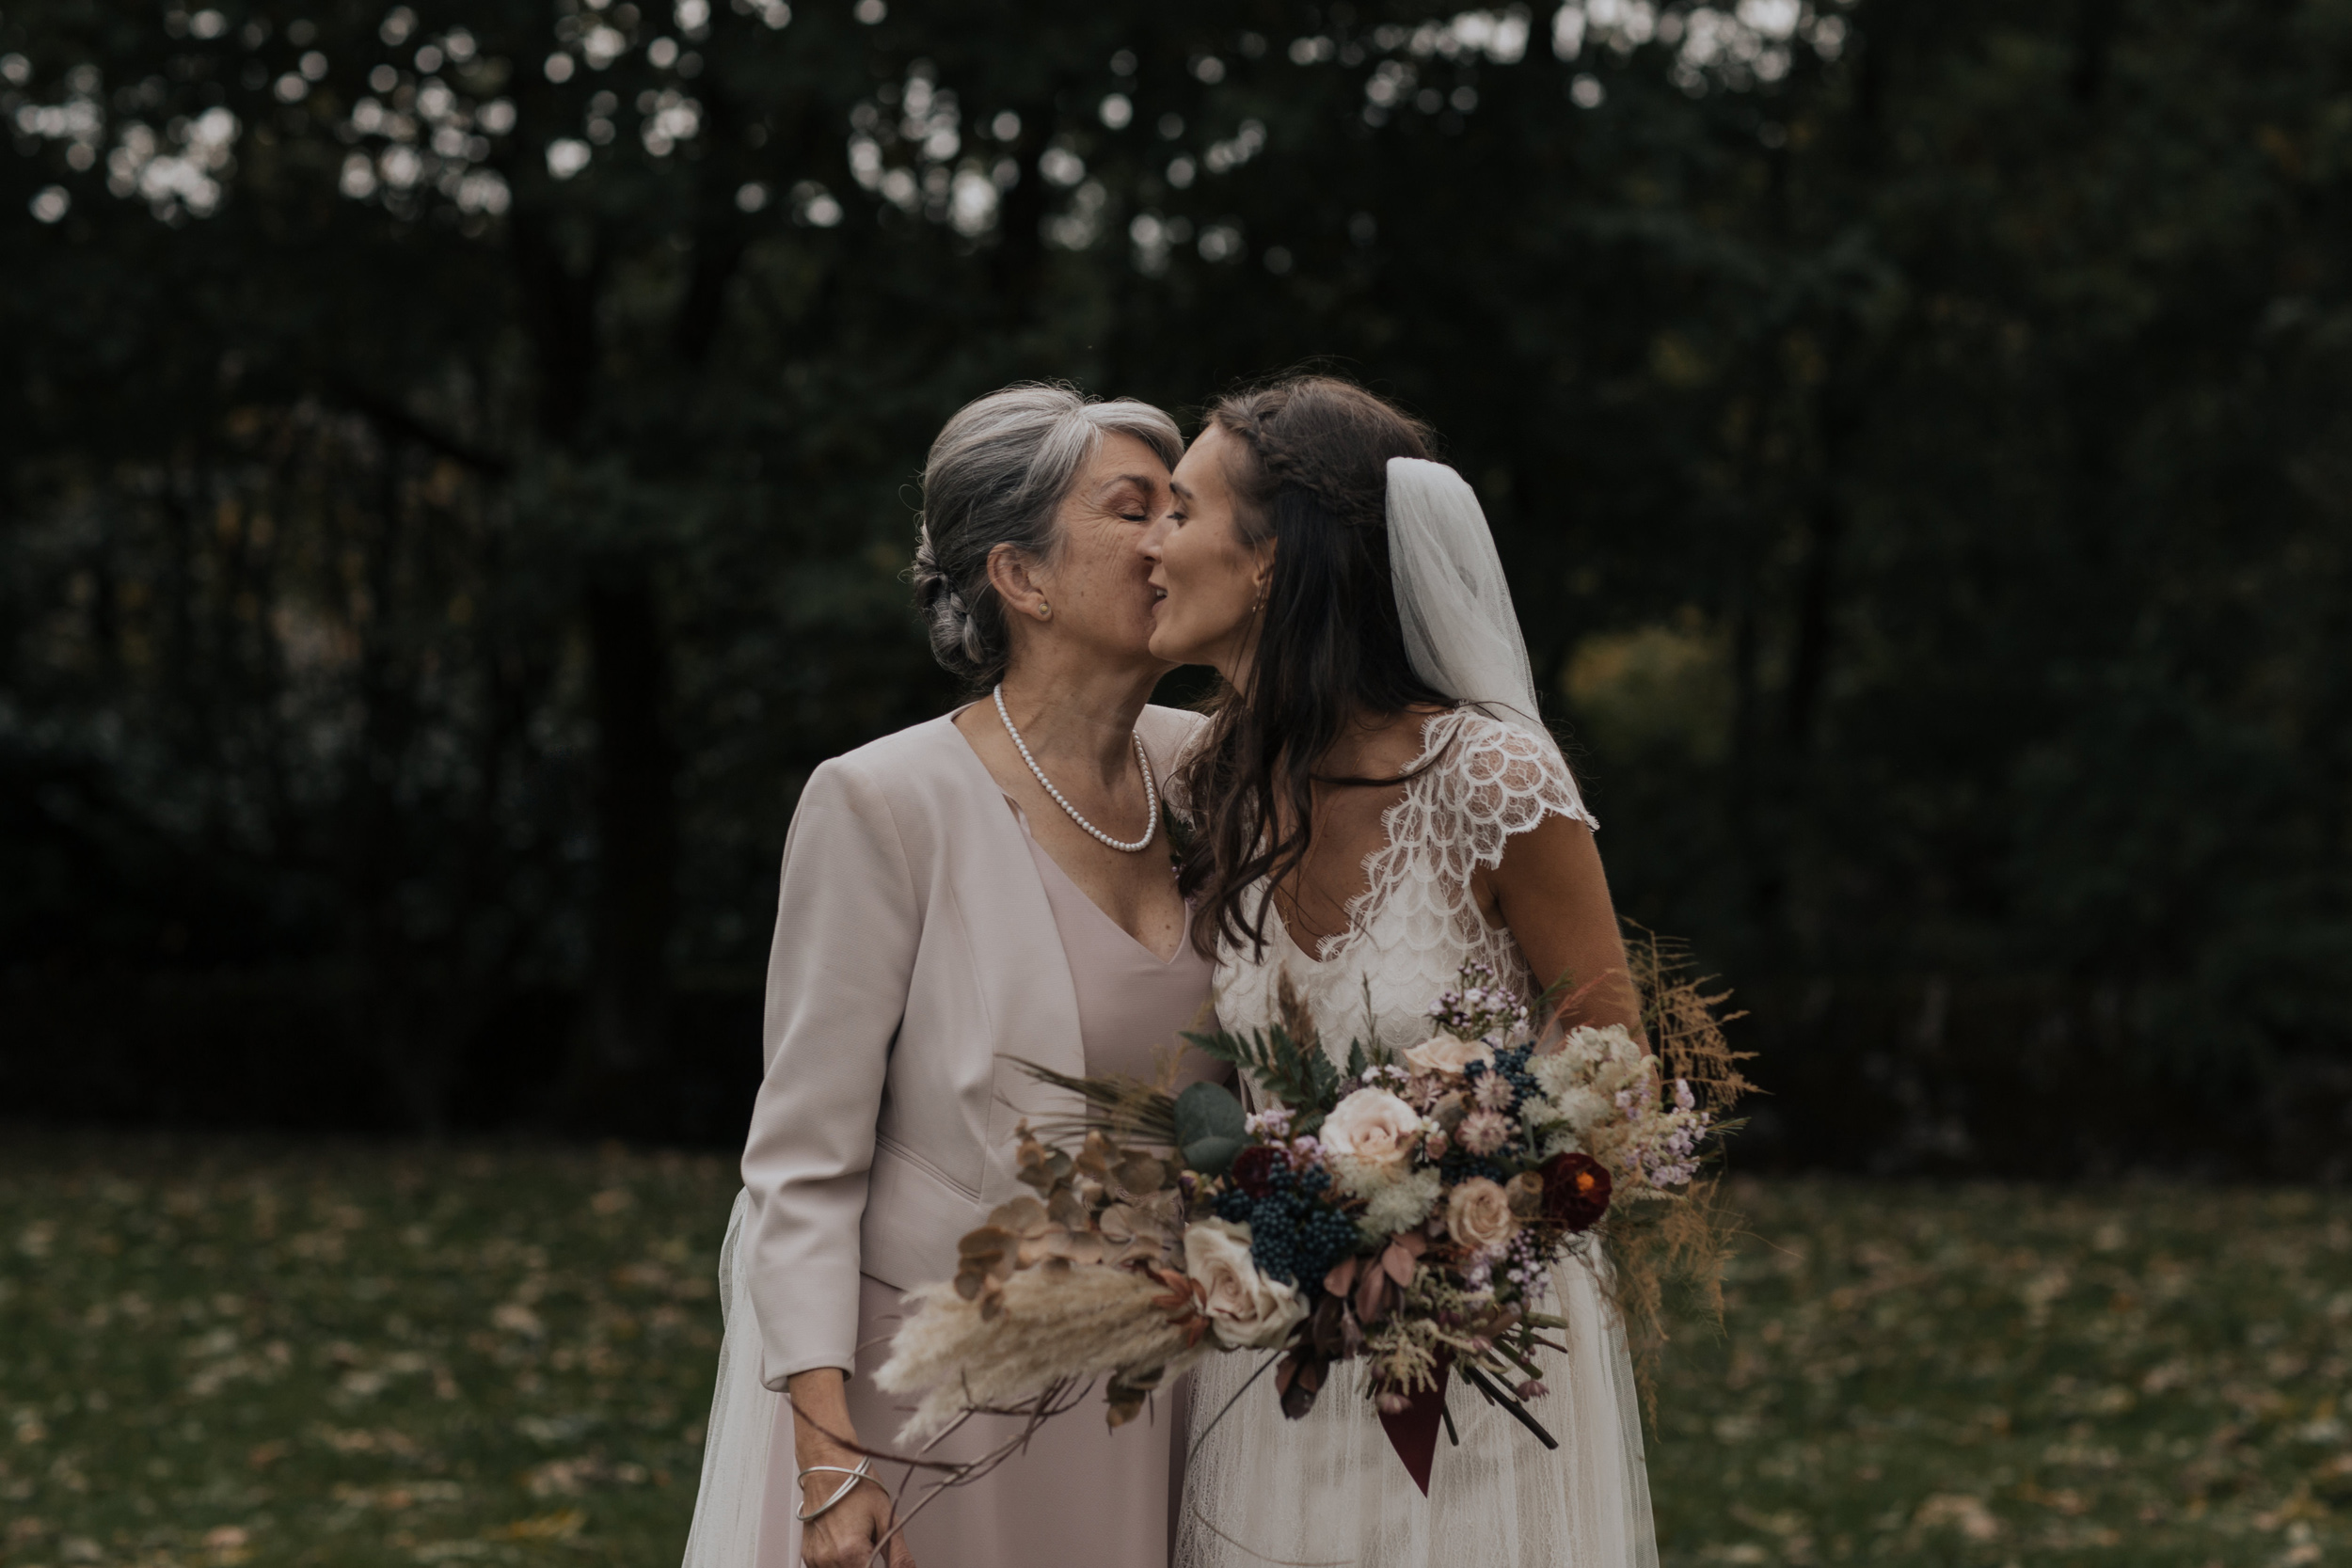 Joasia-Kate-Beaumont-Bohemian-Lace-Wedding-Dress-Peak-District-Sheffield-Wedding-47.jpg